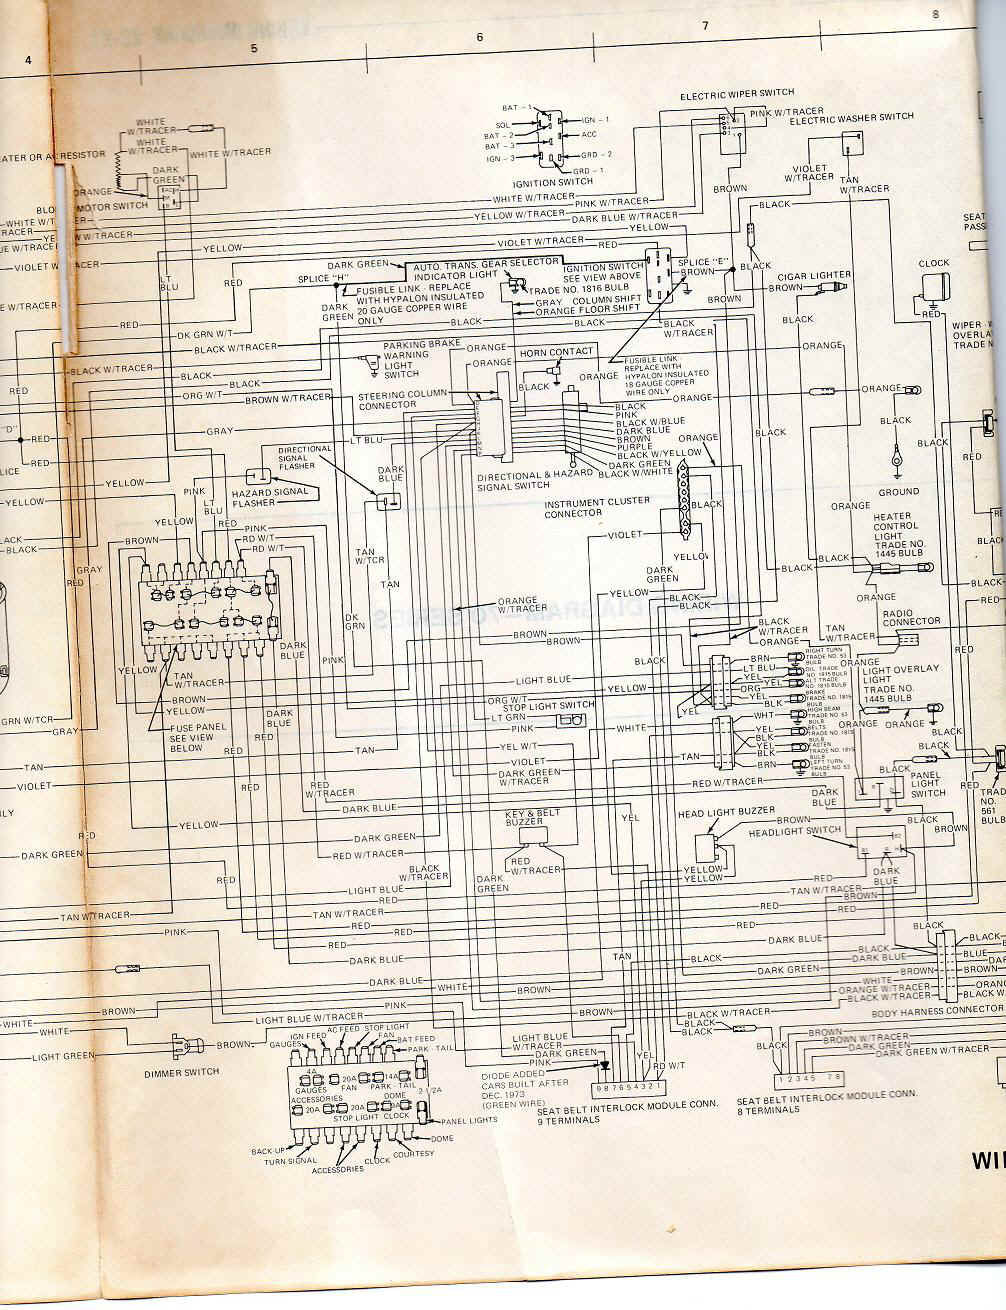 Karmann Ghia Ke Line Diagram Free Download Wiring Diagram Schematic